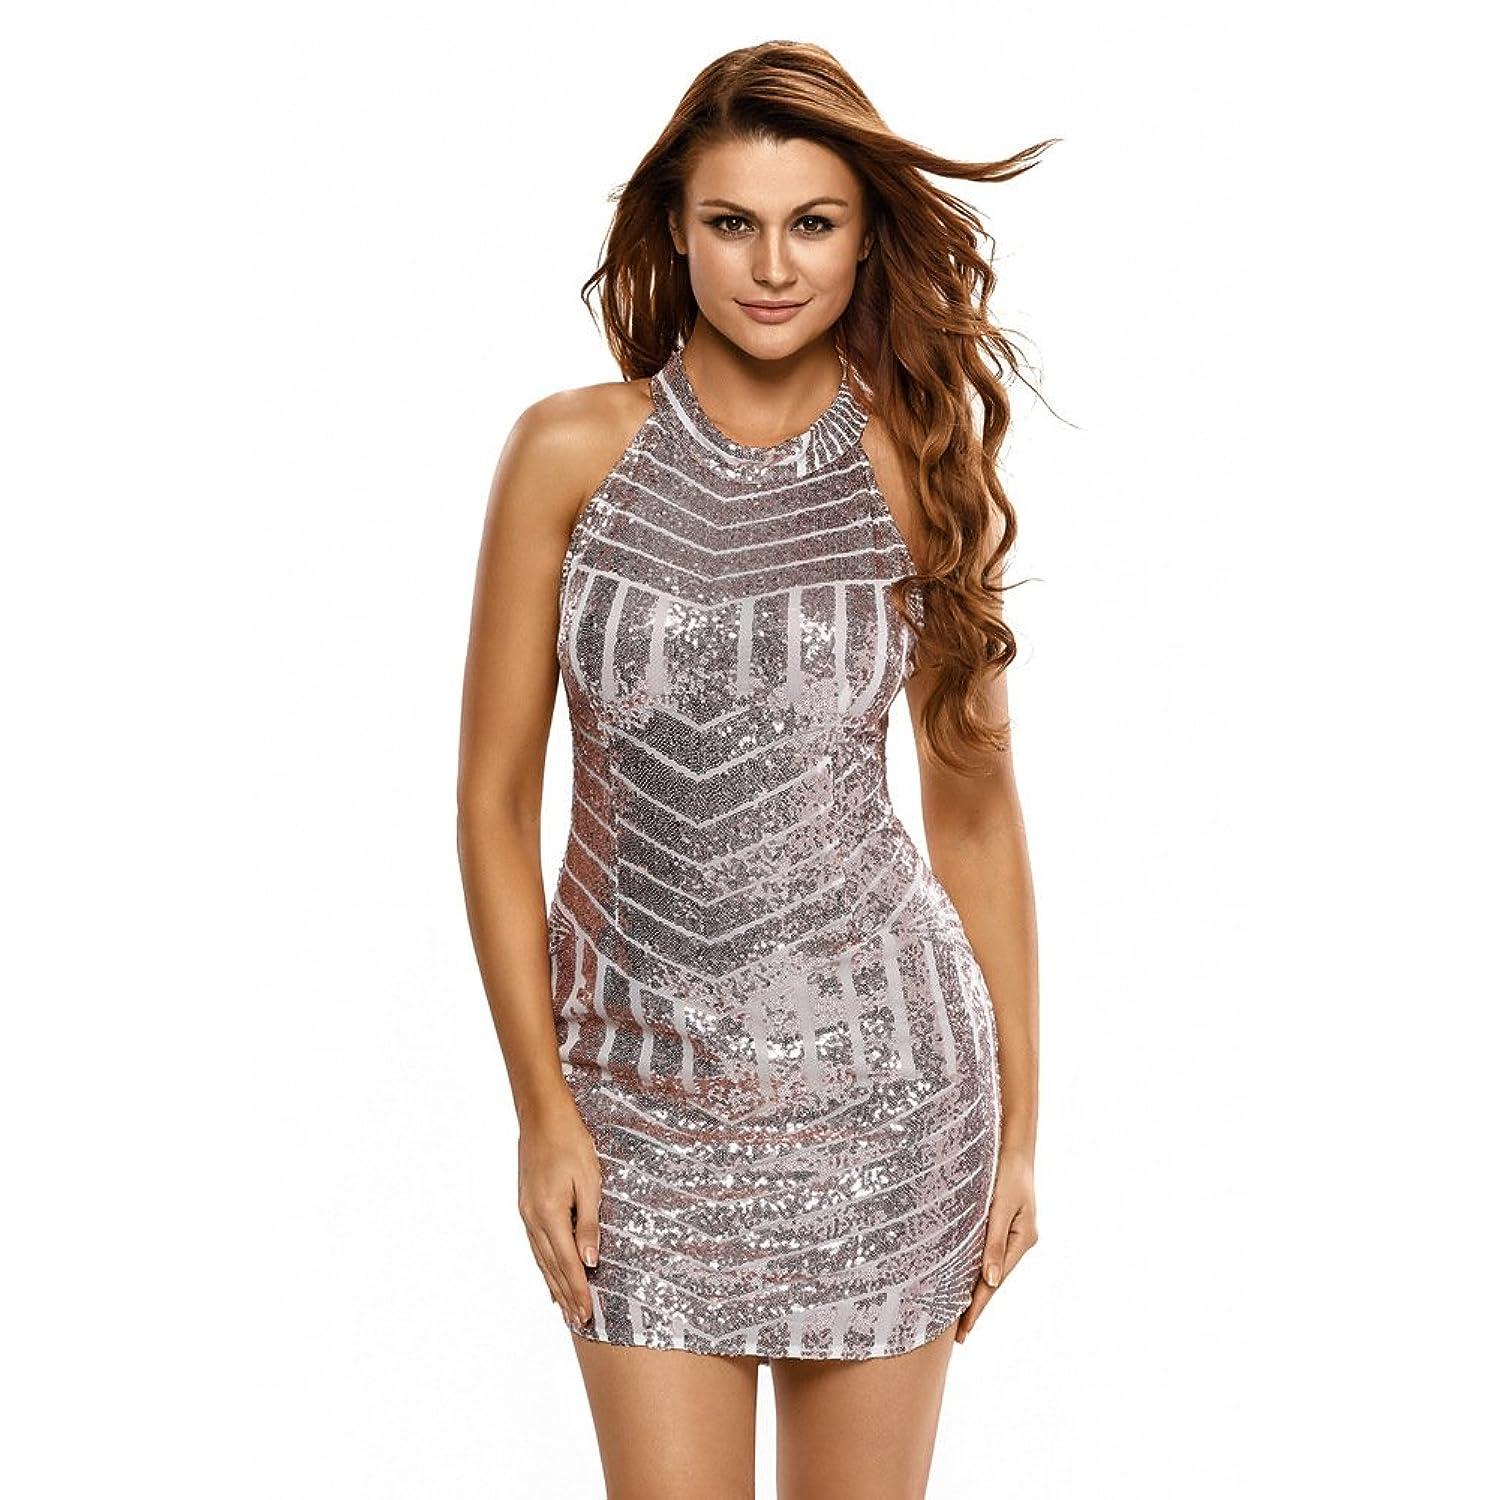 AIWEIYi Womens Summer Night Club Sparkling Sequined Dress